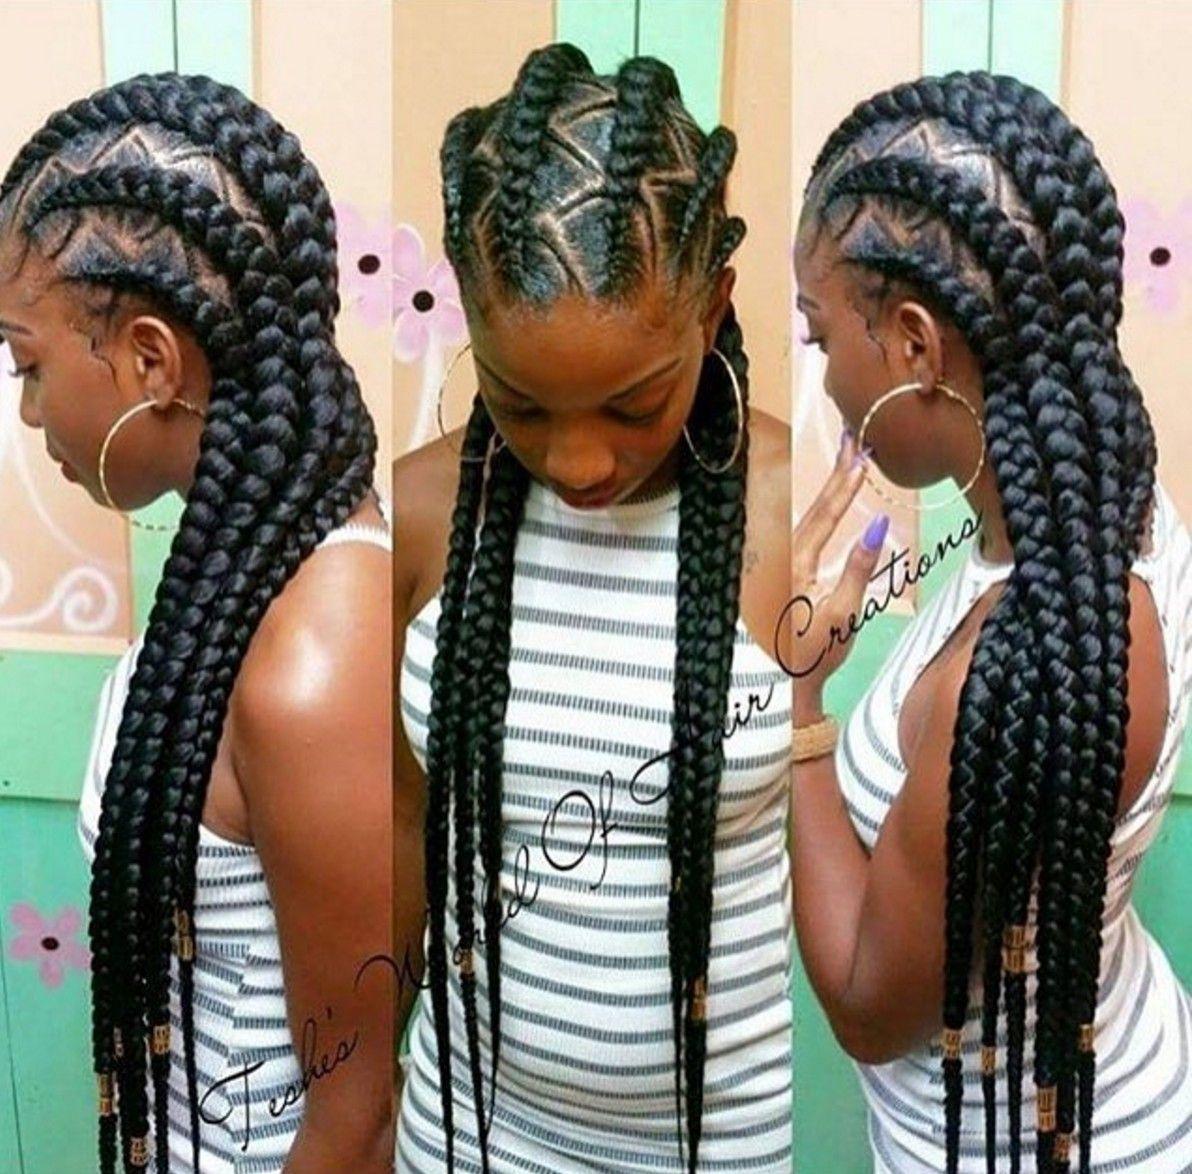 Naturalhairqueens Braids Cornrow Braid Styles Awesome Natural Hair Styles For Black Women Cornrow Hairstyles Natural Hair Styles